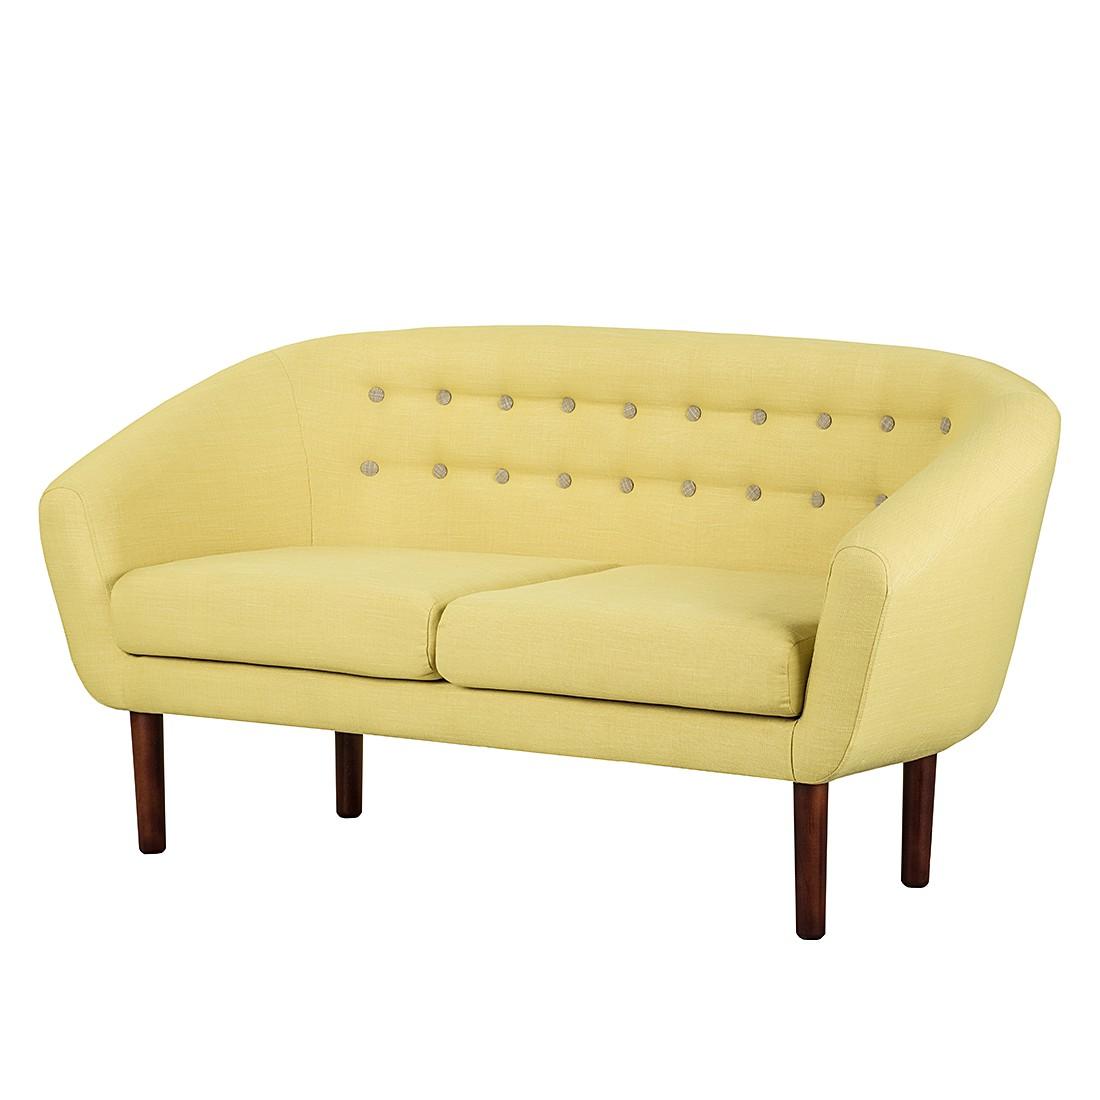 Sofa Anna (2-Sitzer) - Webstoff - Gelb, reconcept